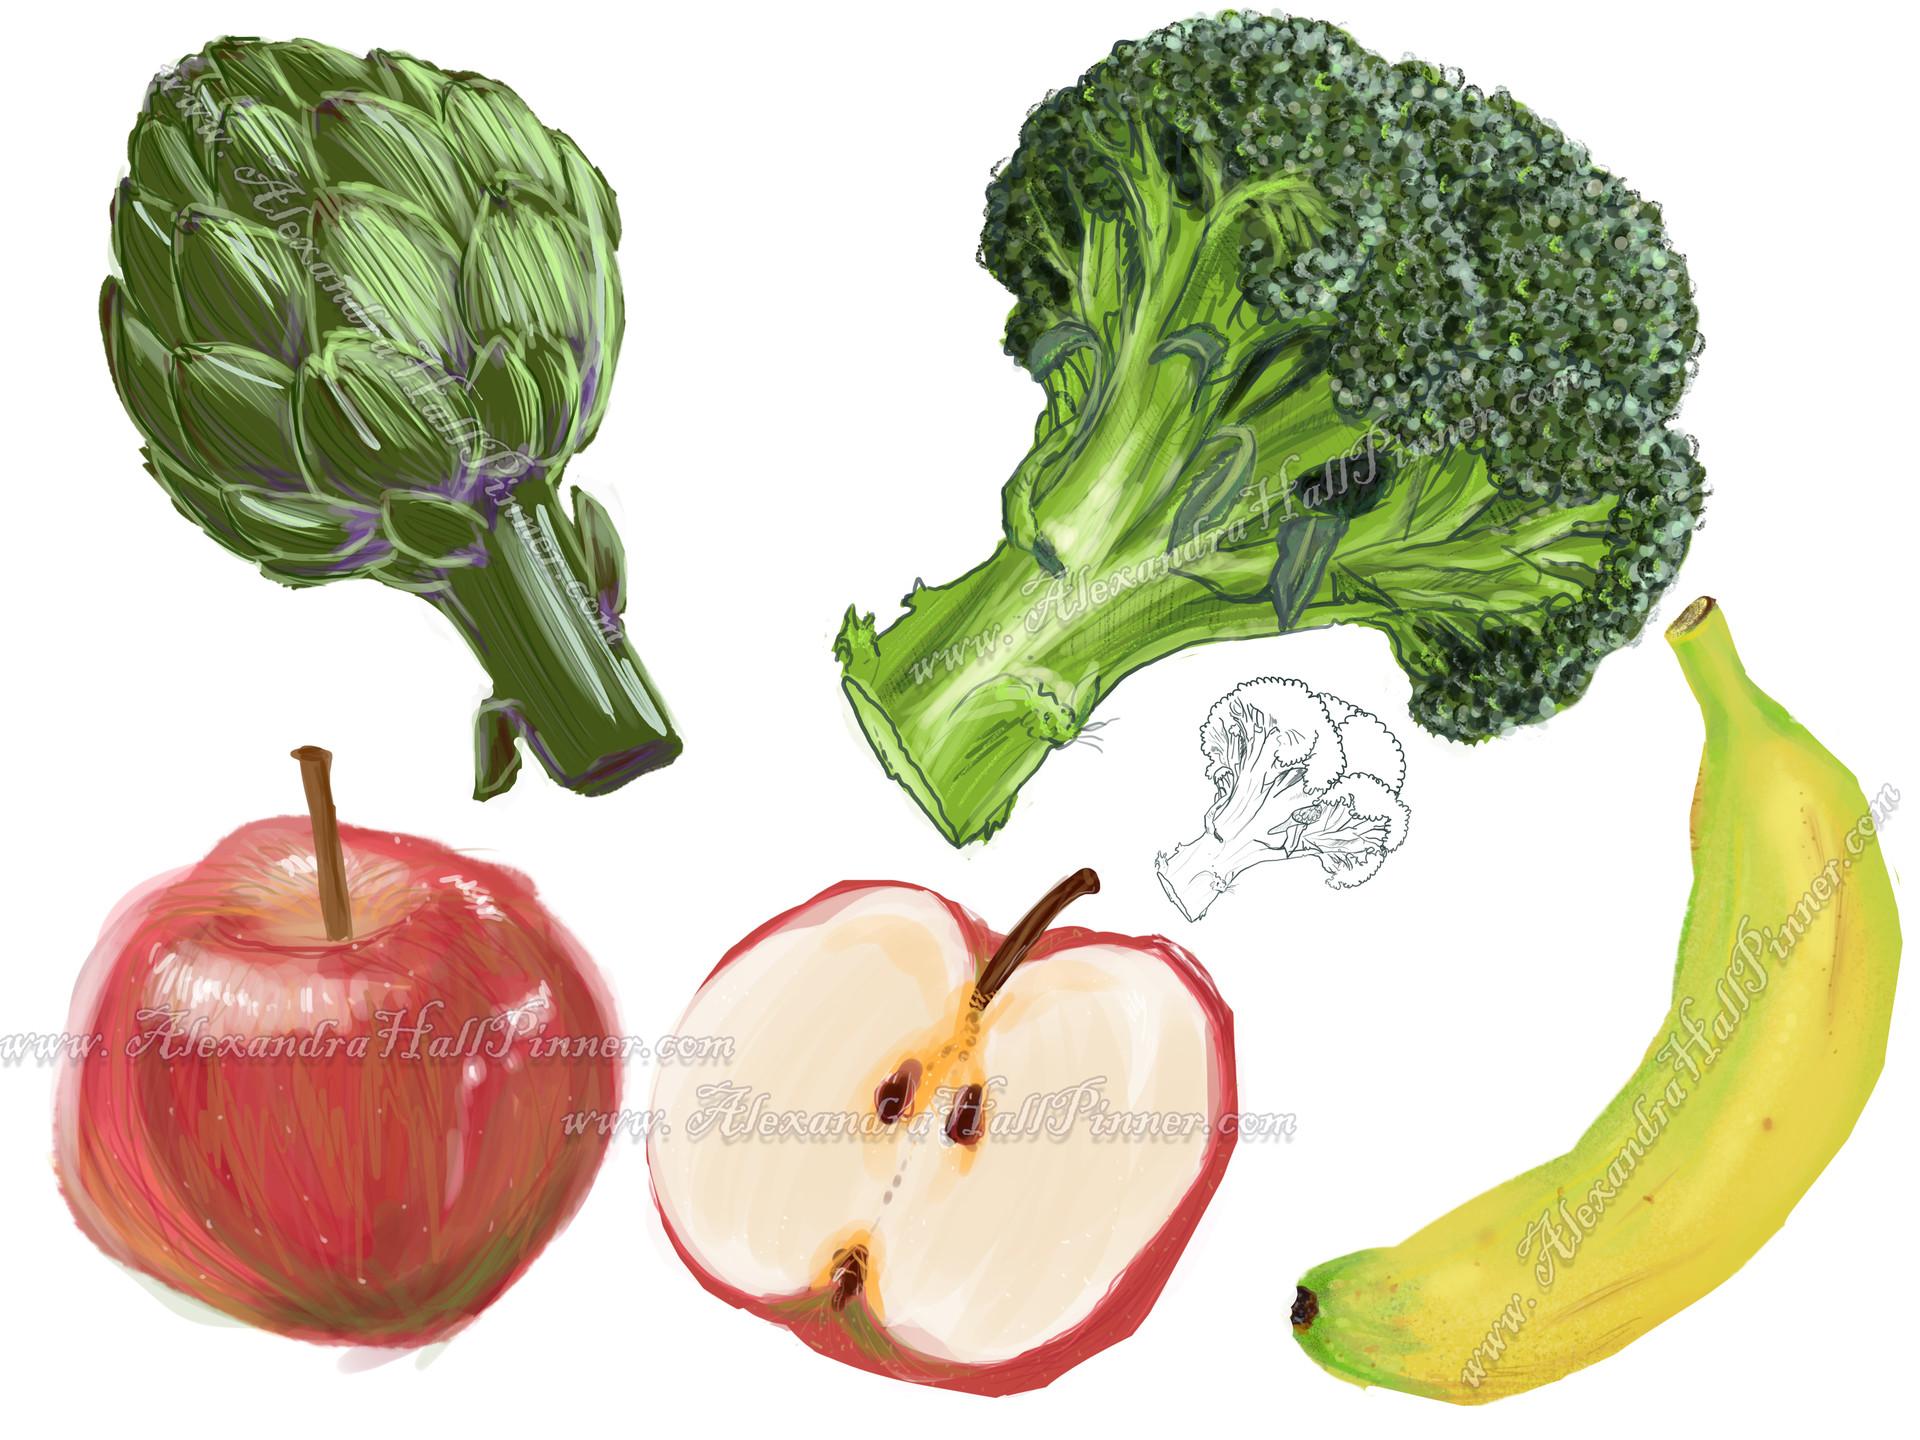 Alexandra hall pinner foods